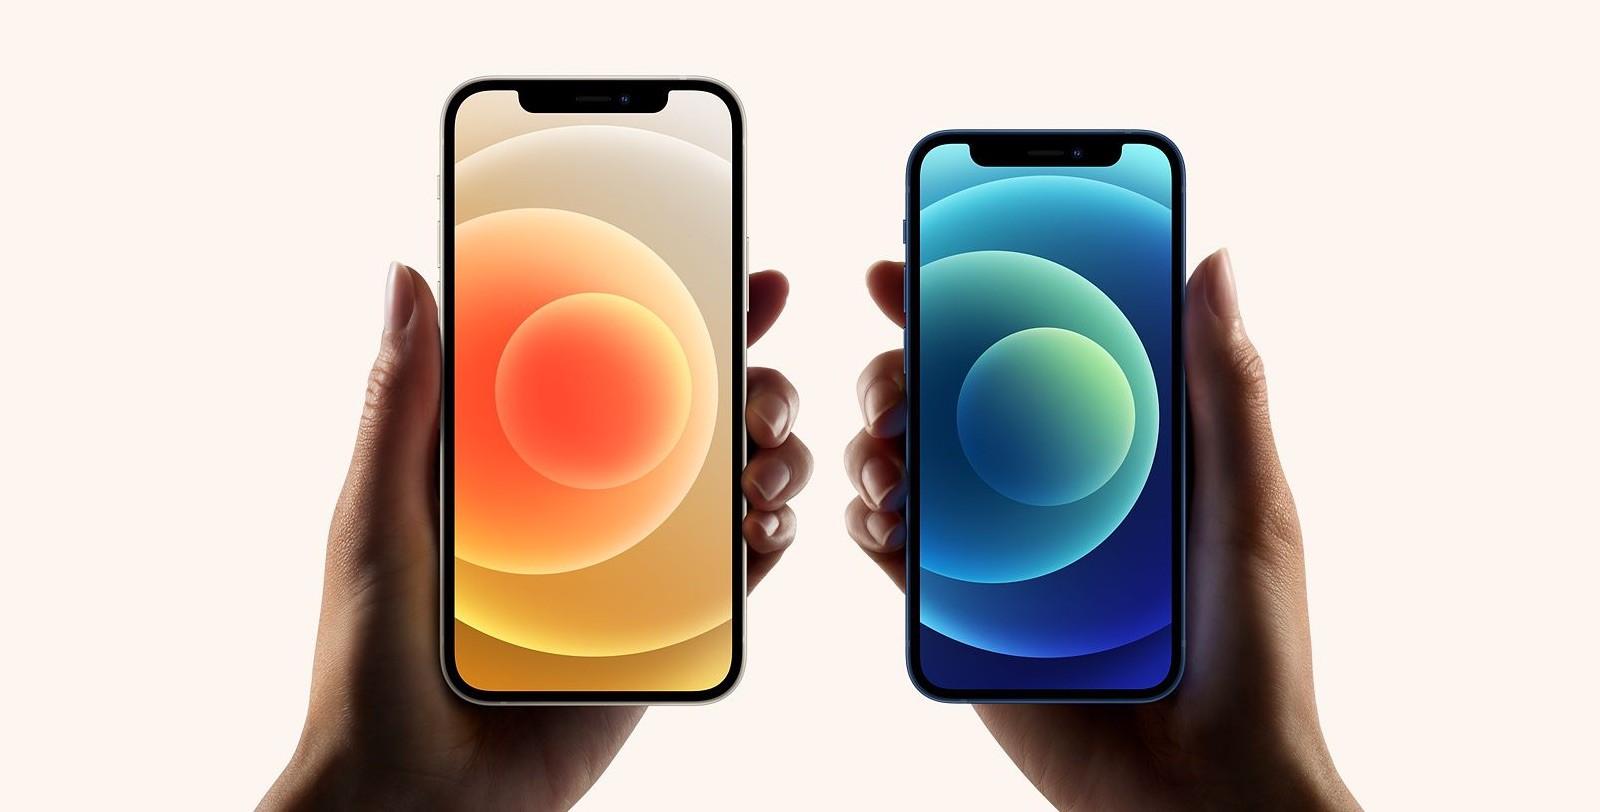 https://images.macrumors.com/t/DSYynjlDD4oI-u1LcQu26tebkLE=/1600x0/filters:quality(90)/article-new/2020/10/iphone-12-vs-iphone-12-mini.jpg